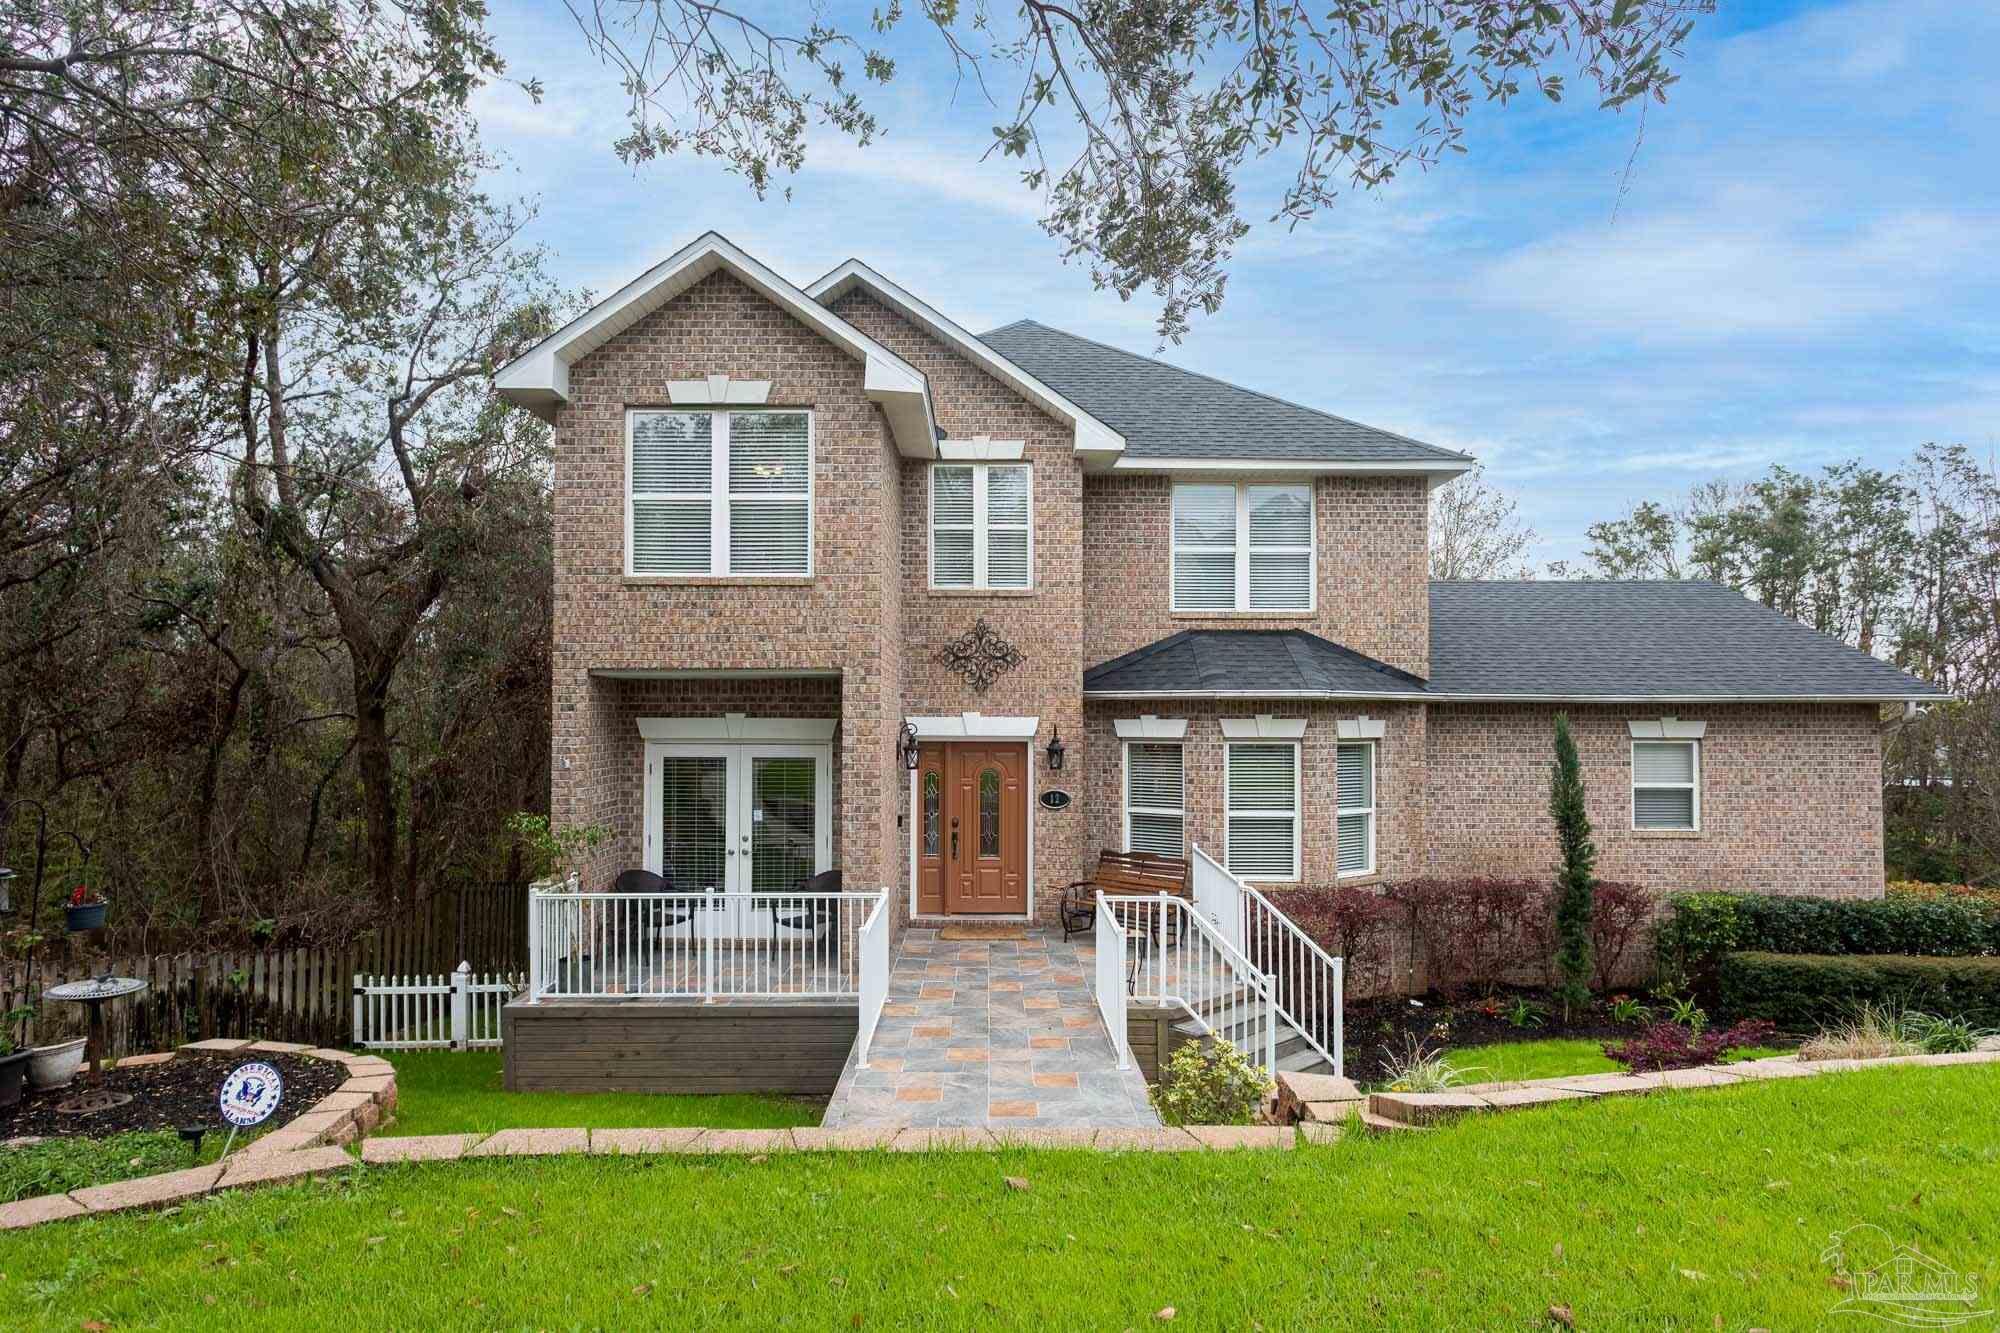 12 SHORELINE PL, Gulf Breeze, Florida 32561, 4 Bedrooms Bedrooms, ,4 BathroomsBathrooms,Single Family,For Sale,12 SHORELINE PL,3,586949